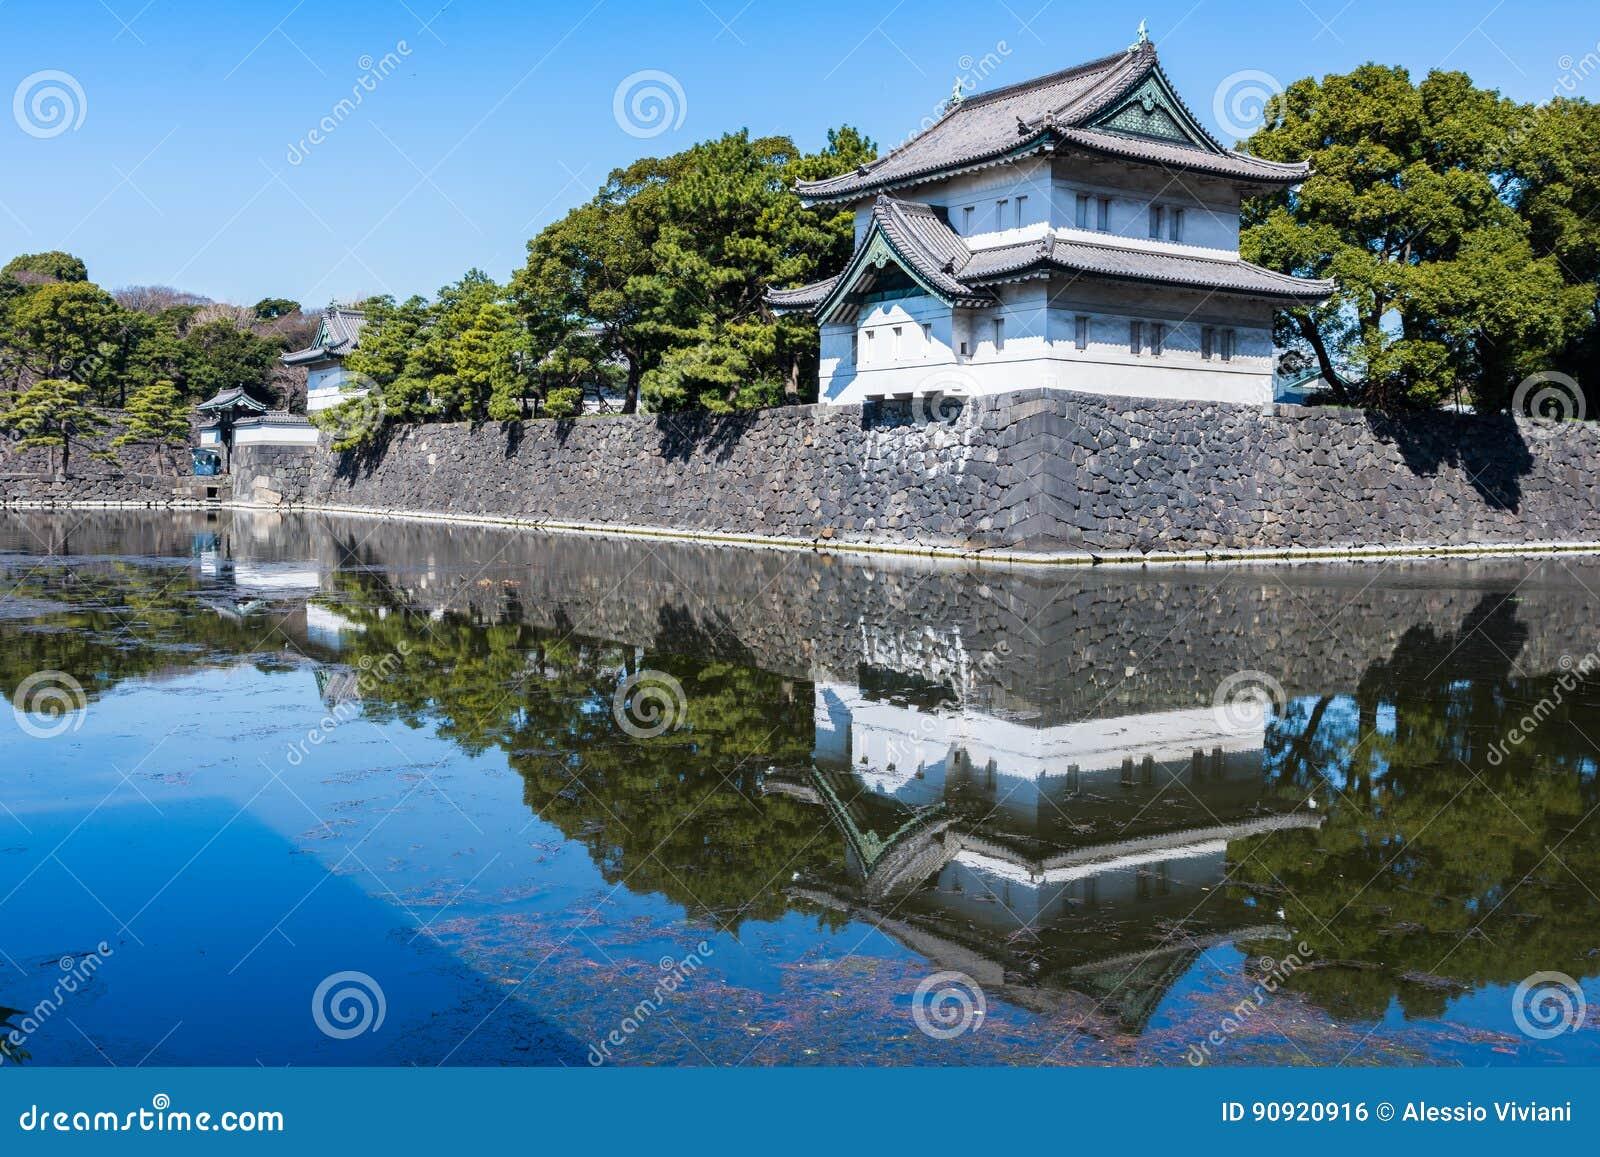 Cesarski pałac park w Tokio